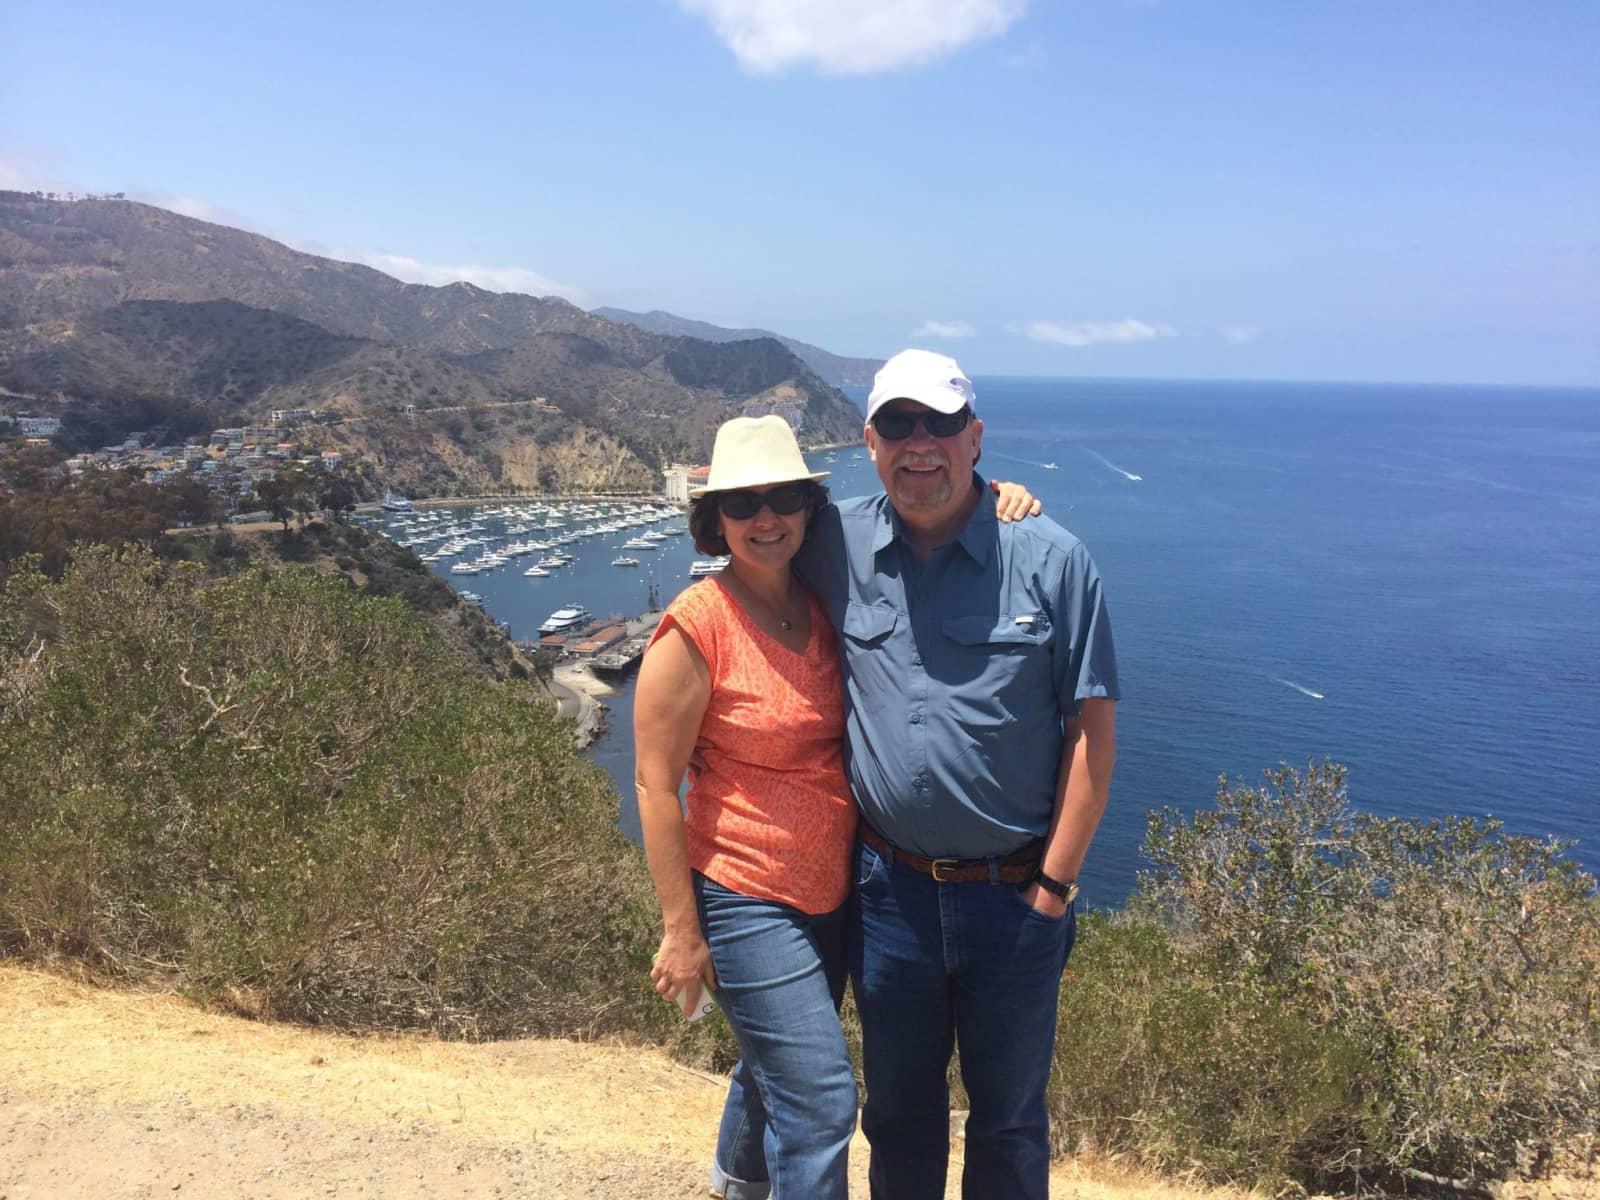 John & Susan from Boquete, Panama